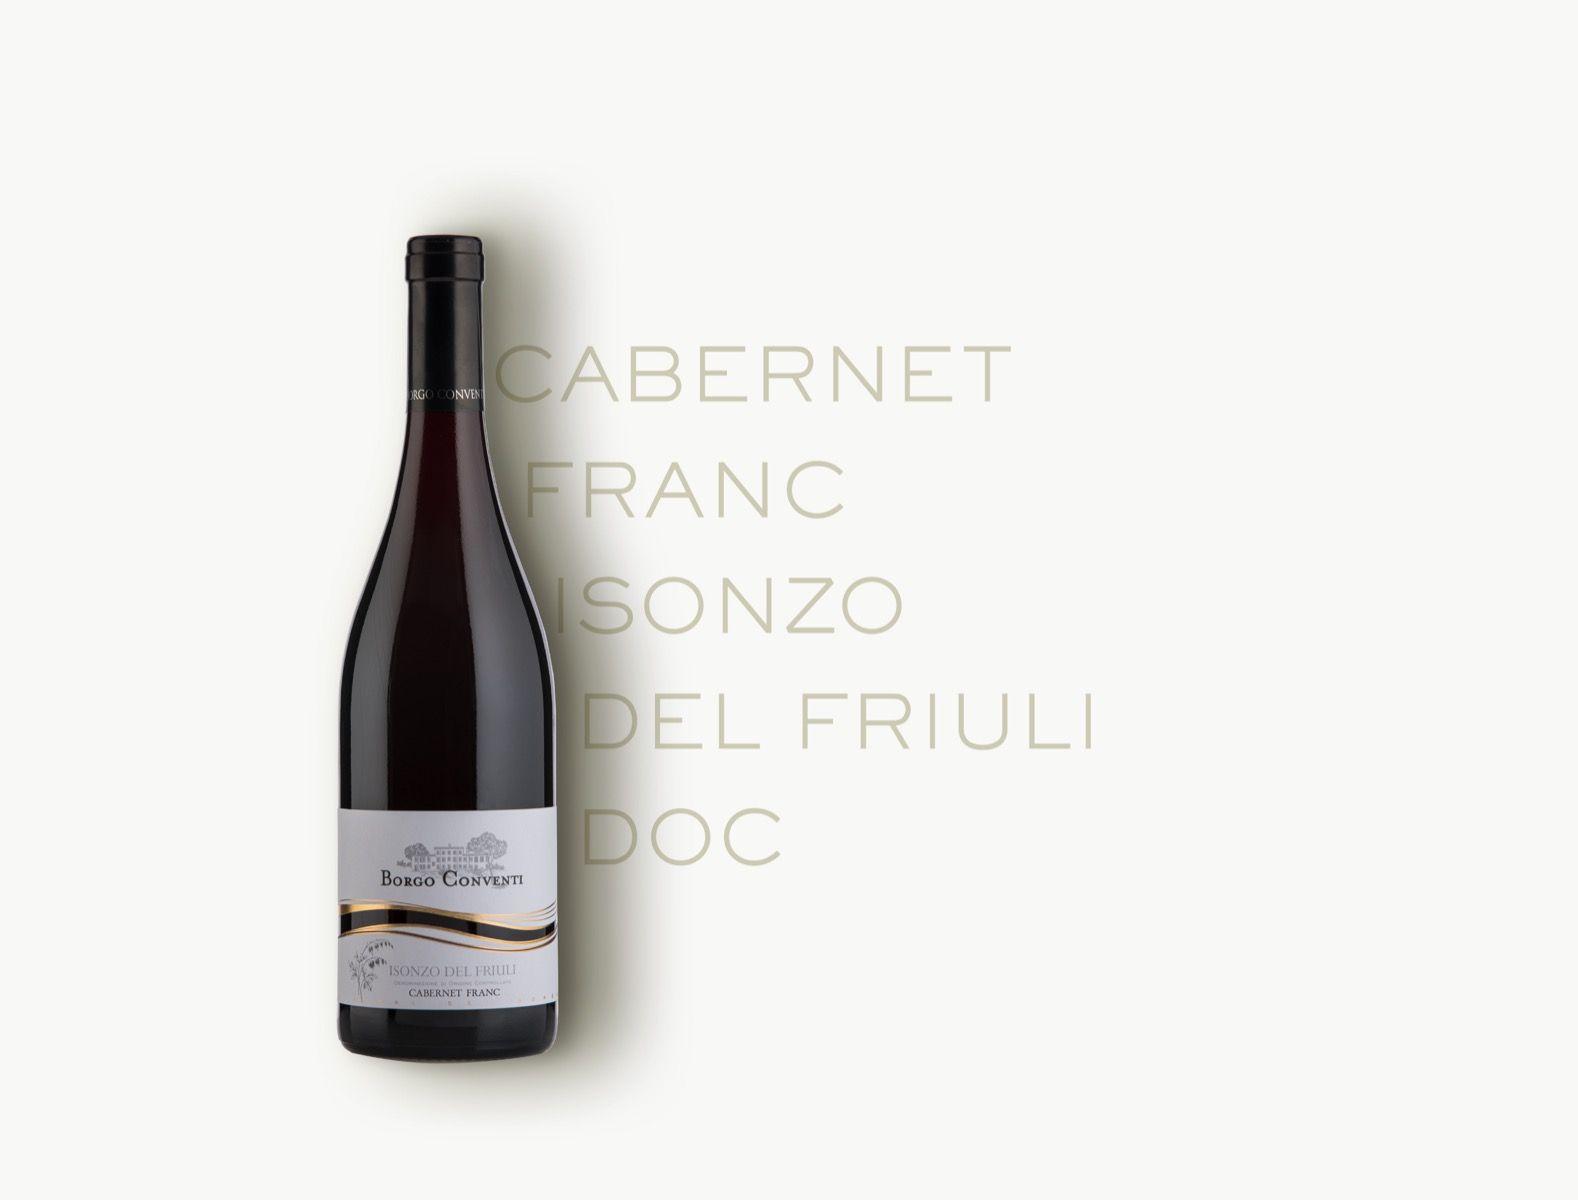 Cabernet Franc Isonzo del Friuli DOC